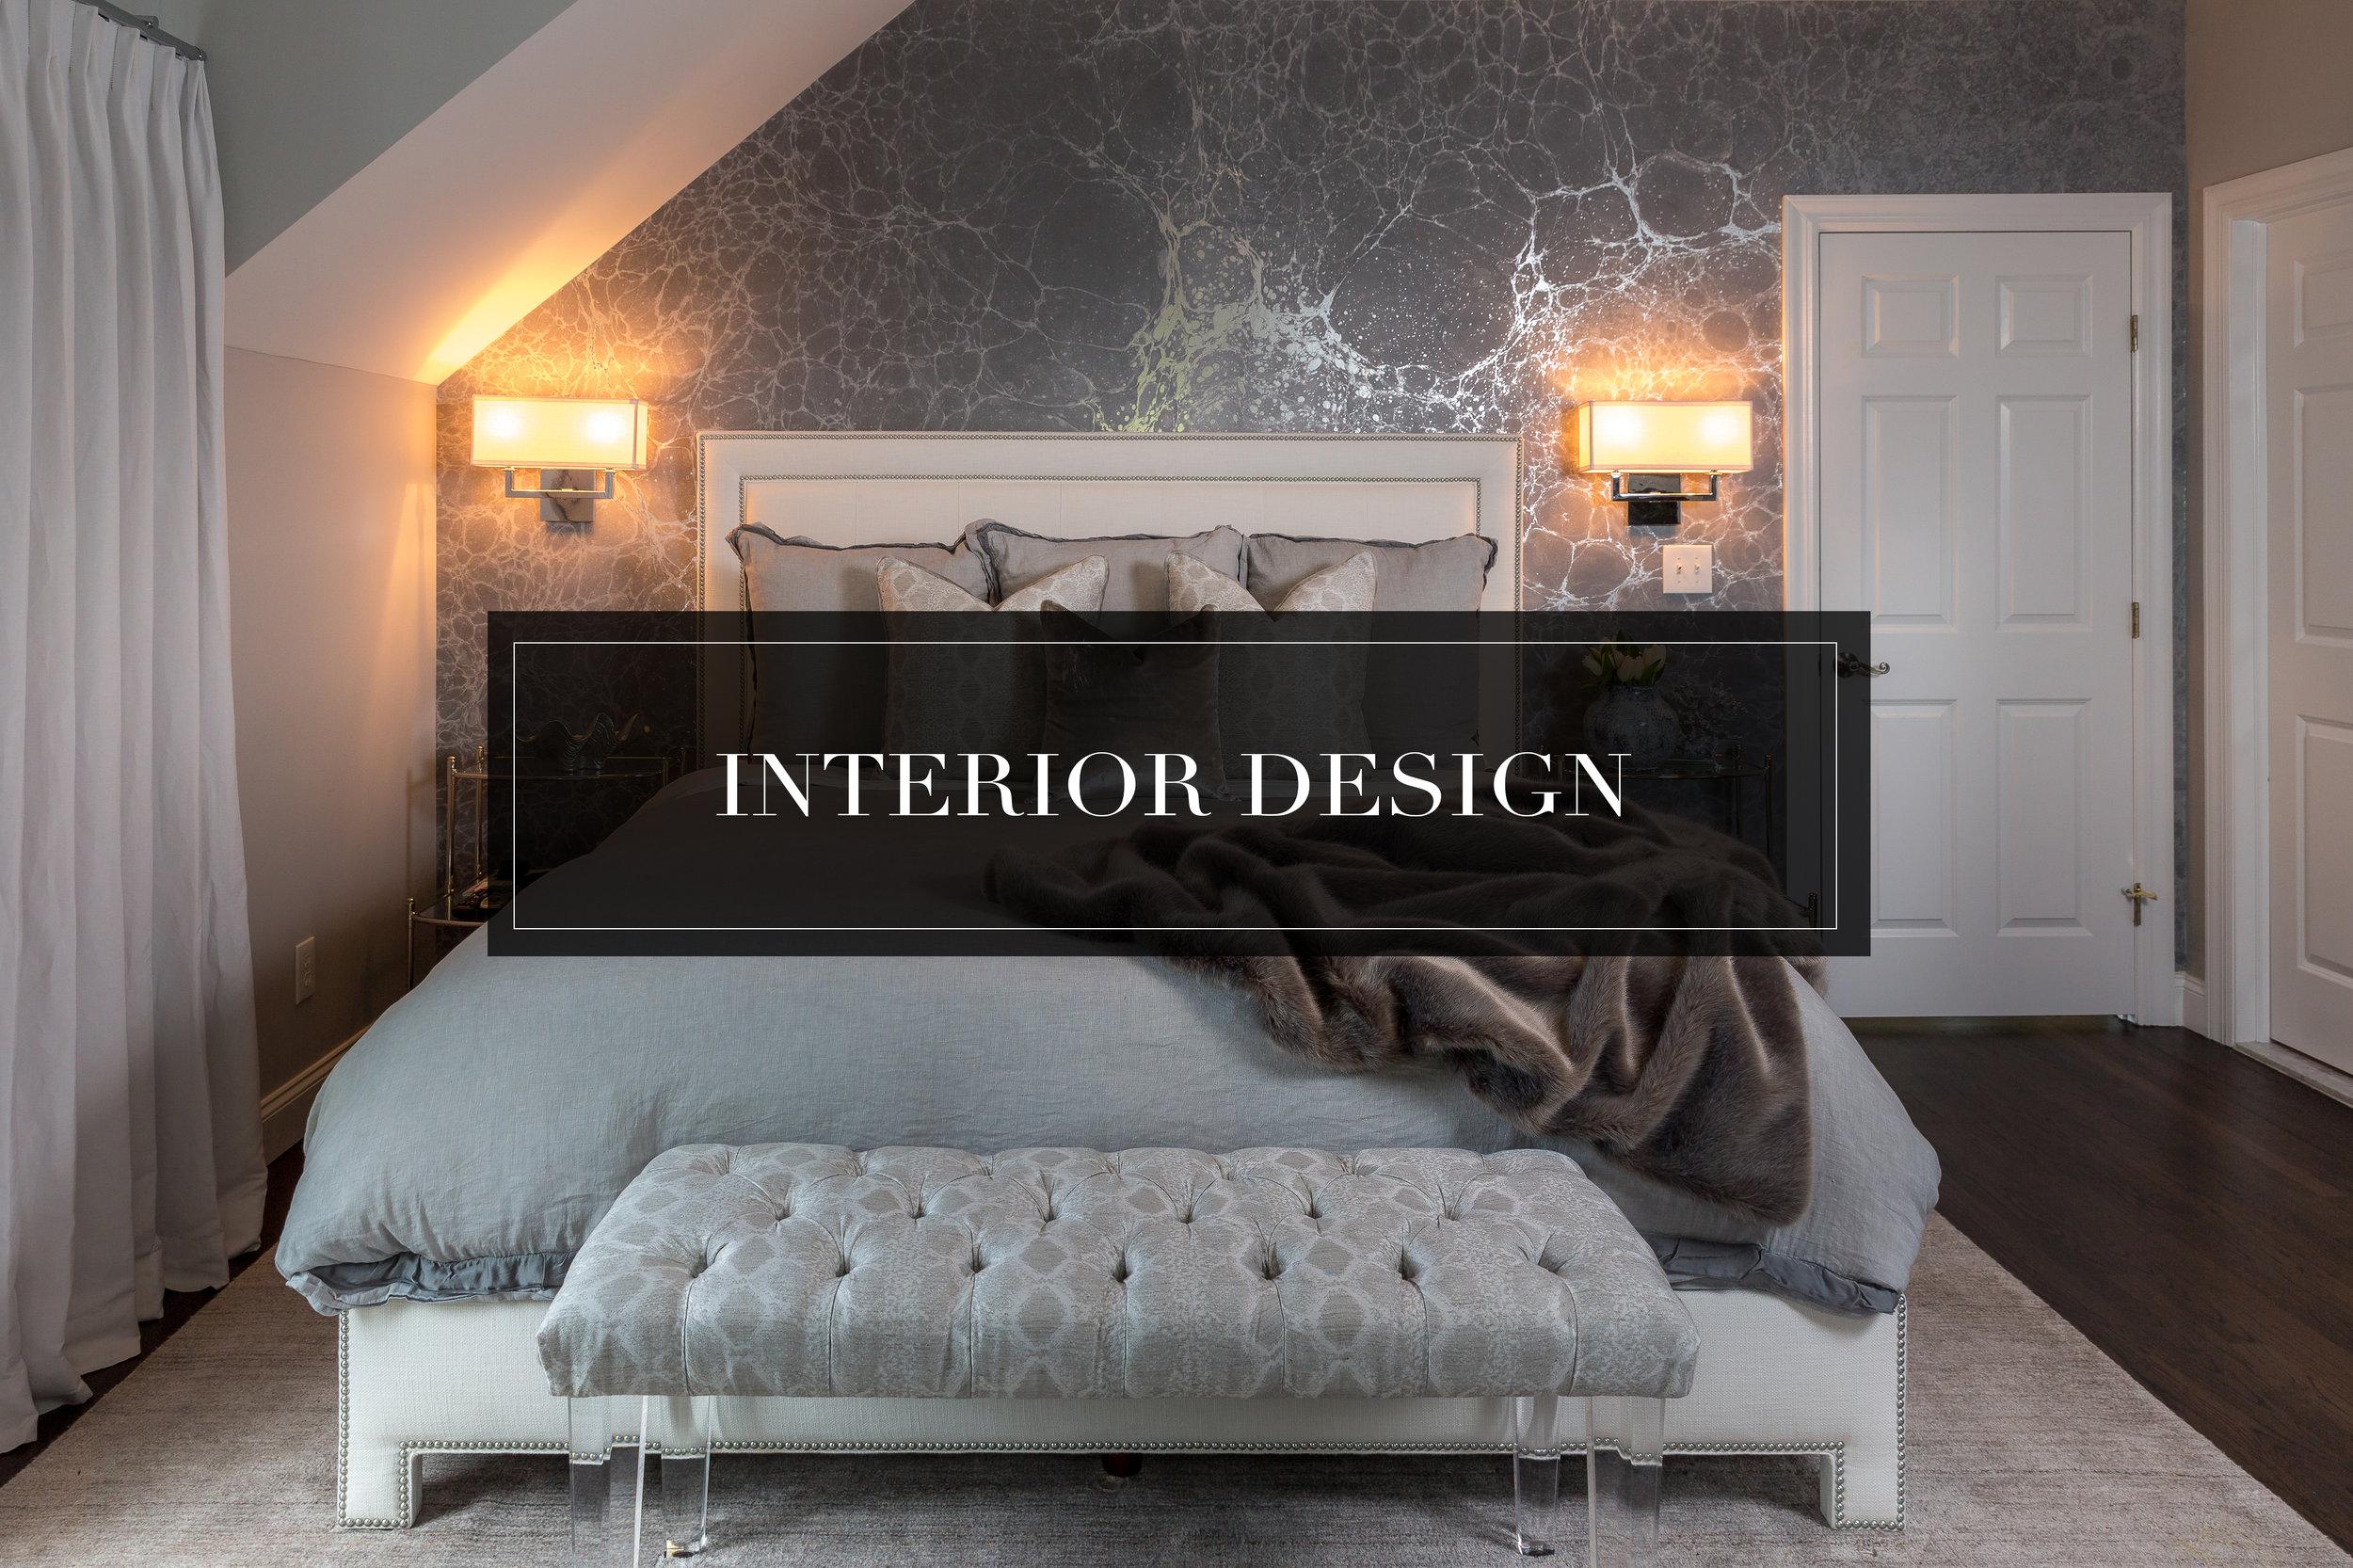 NEW interior design cover.jpg